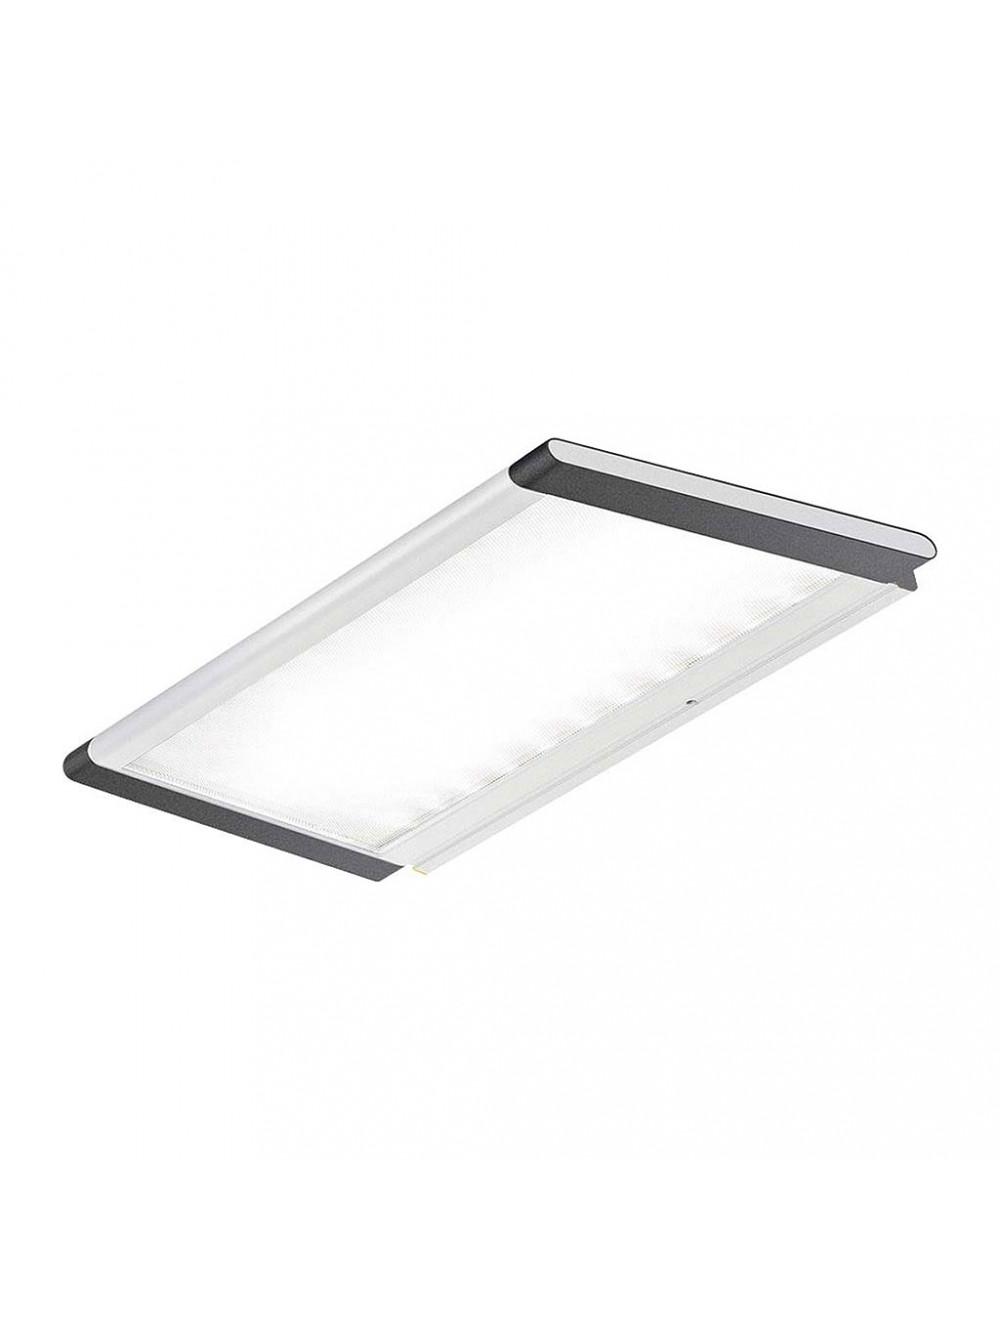 Das Produkt Reitel LED-Leuchte Mini zur Wandmontage 19100000 aus dem Global-dent online shop.